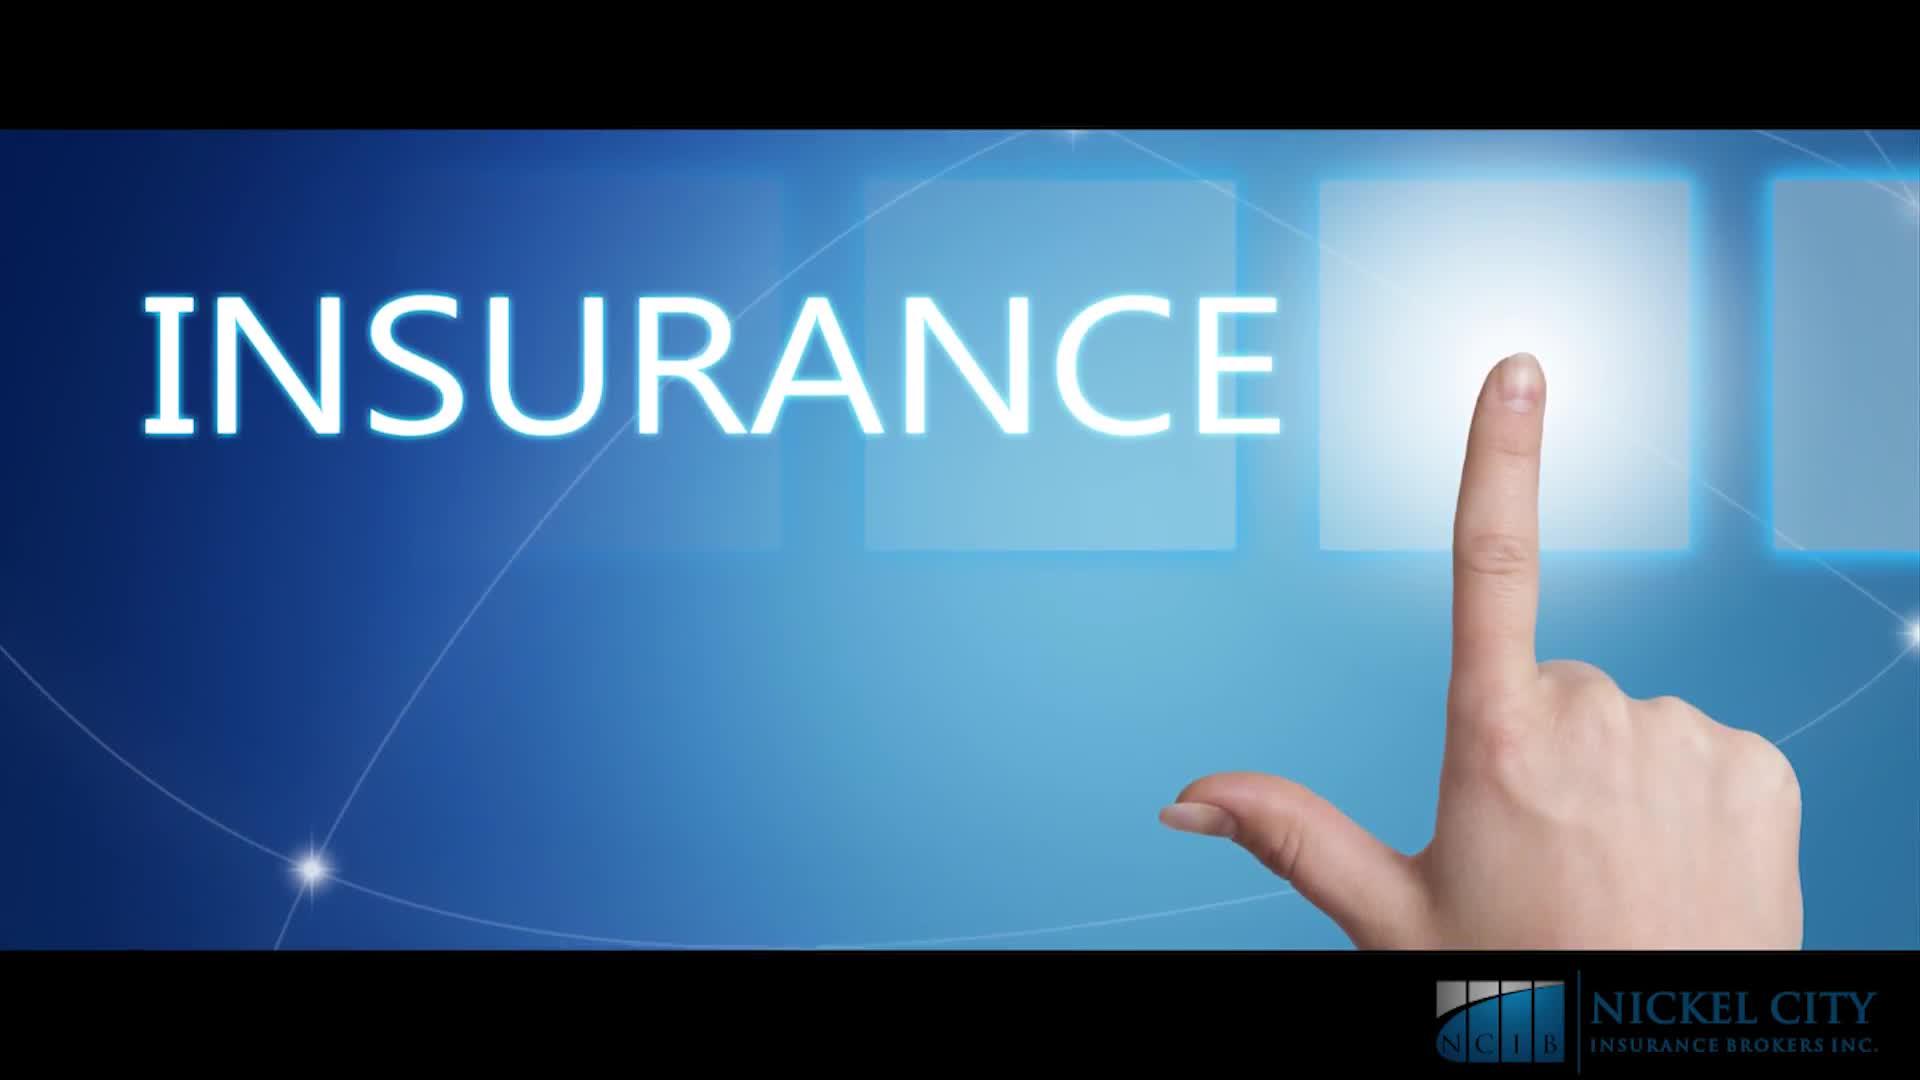 Nickel City Insurance Brokers Inc - Insurance - 7055666715